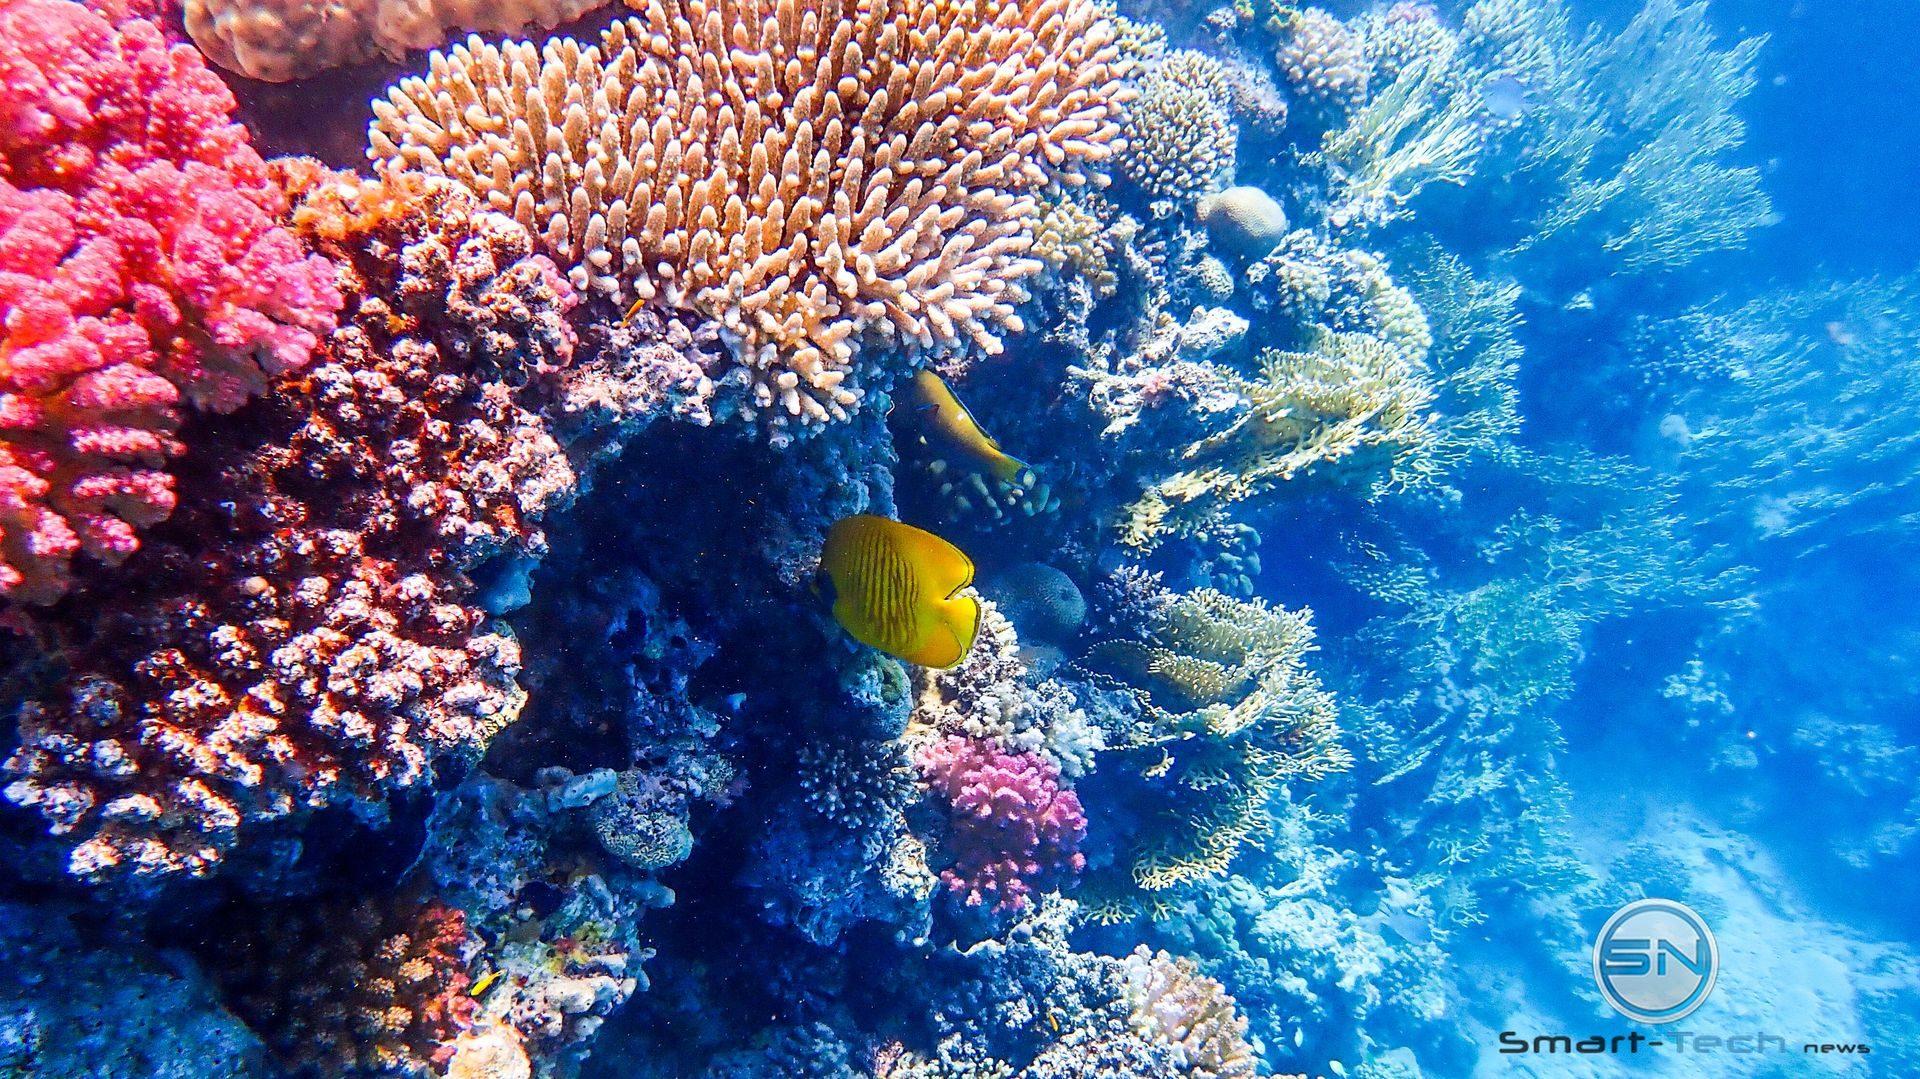 Korallengarten in Steilwand - Olympus TG5